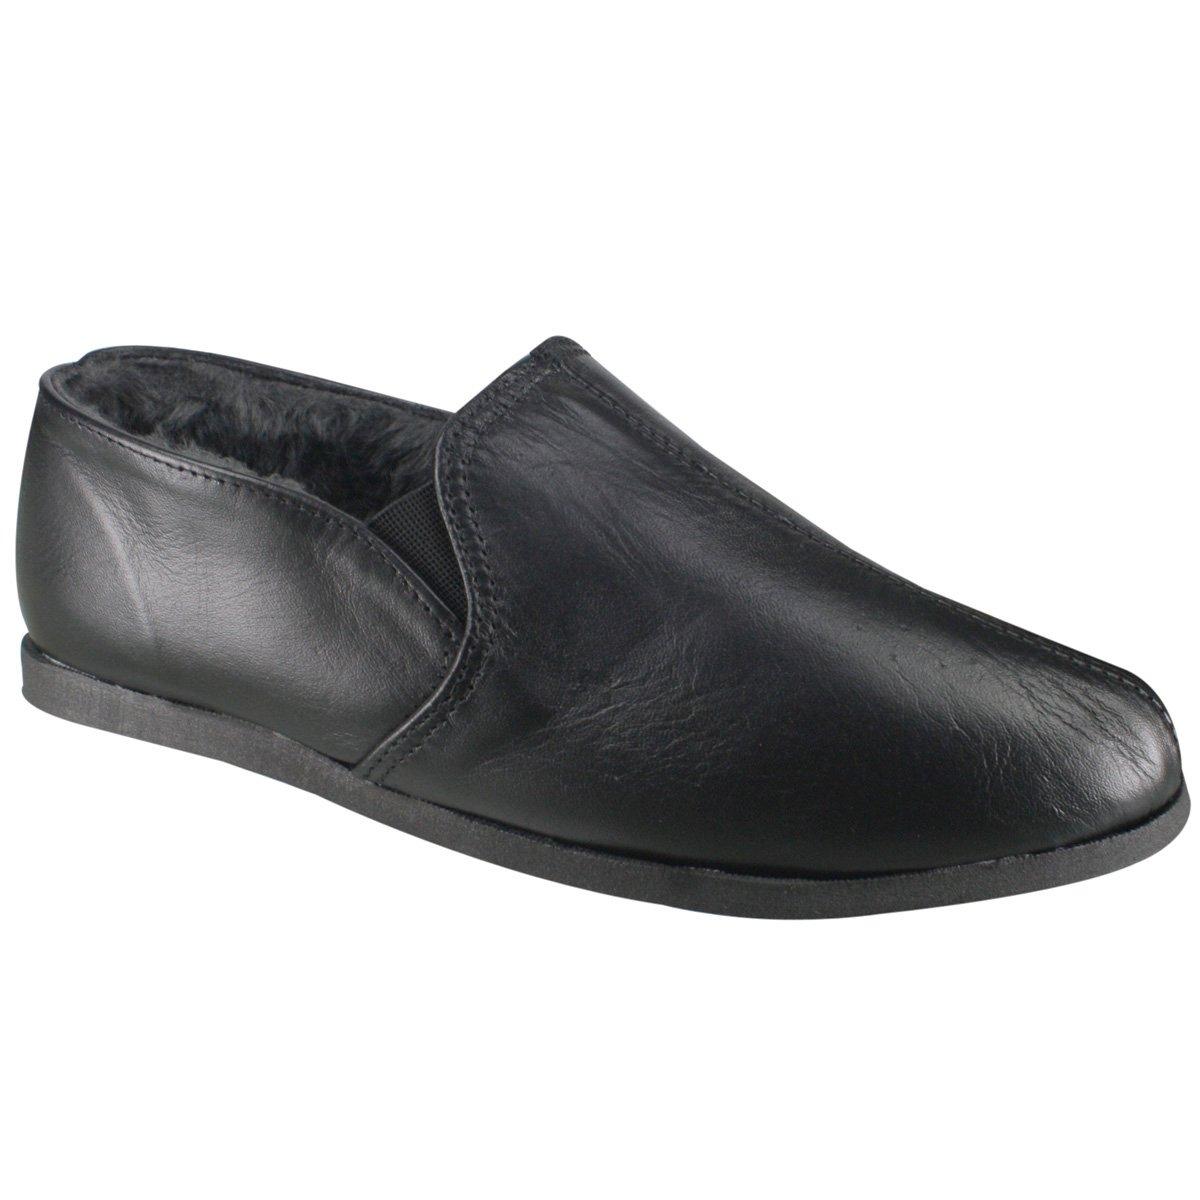 b9574b40a Sapato Spiazzi Com Pelo Masculino 255 - Preto - Botas Online ...